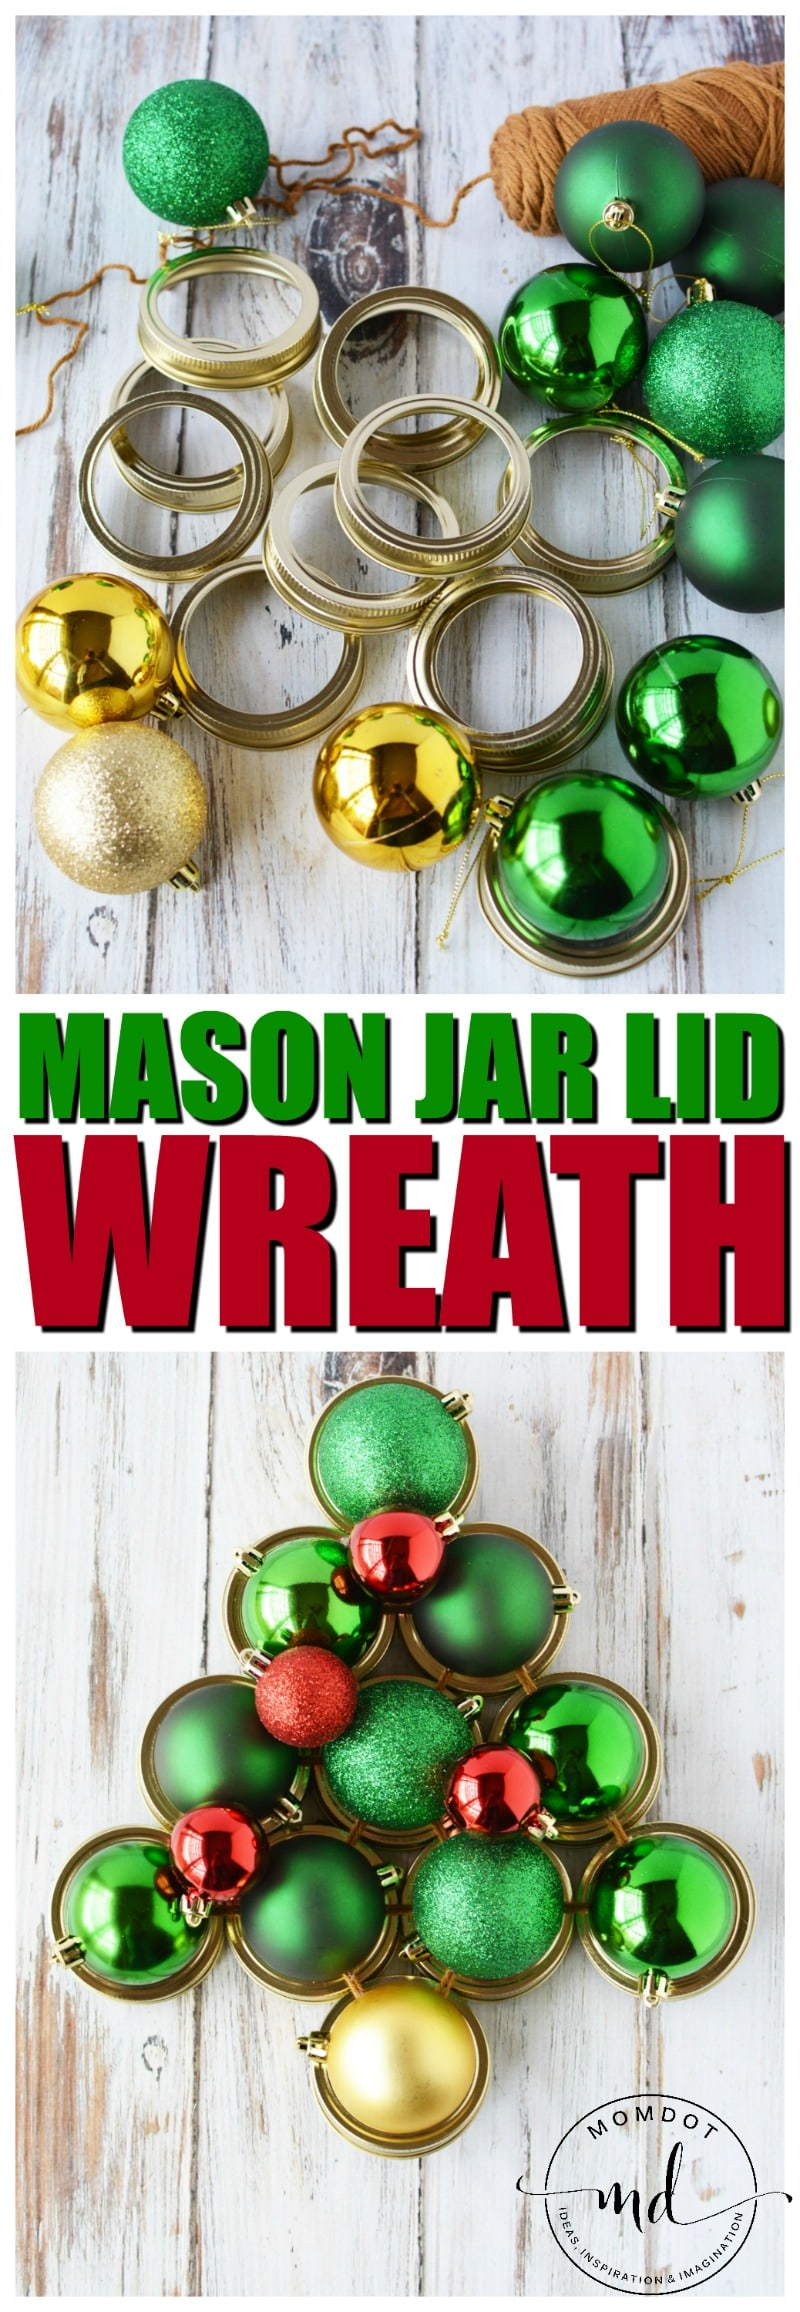 Mason Jar Lid Wreath | Christmas Wreath Tutorial using Mason Jar Lids | Holiday Mason Jar Crafts